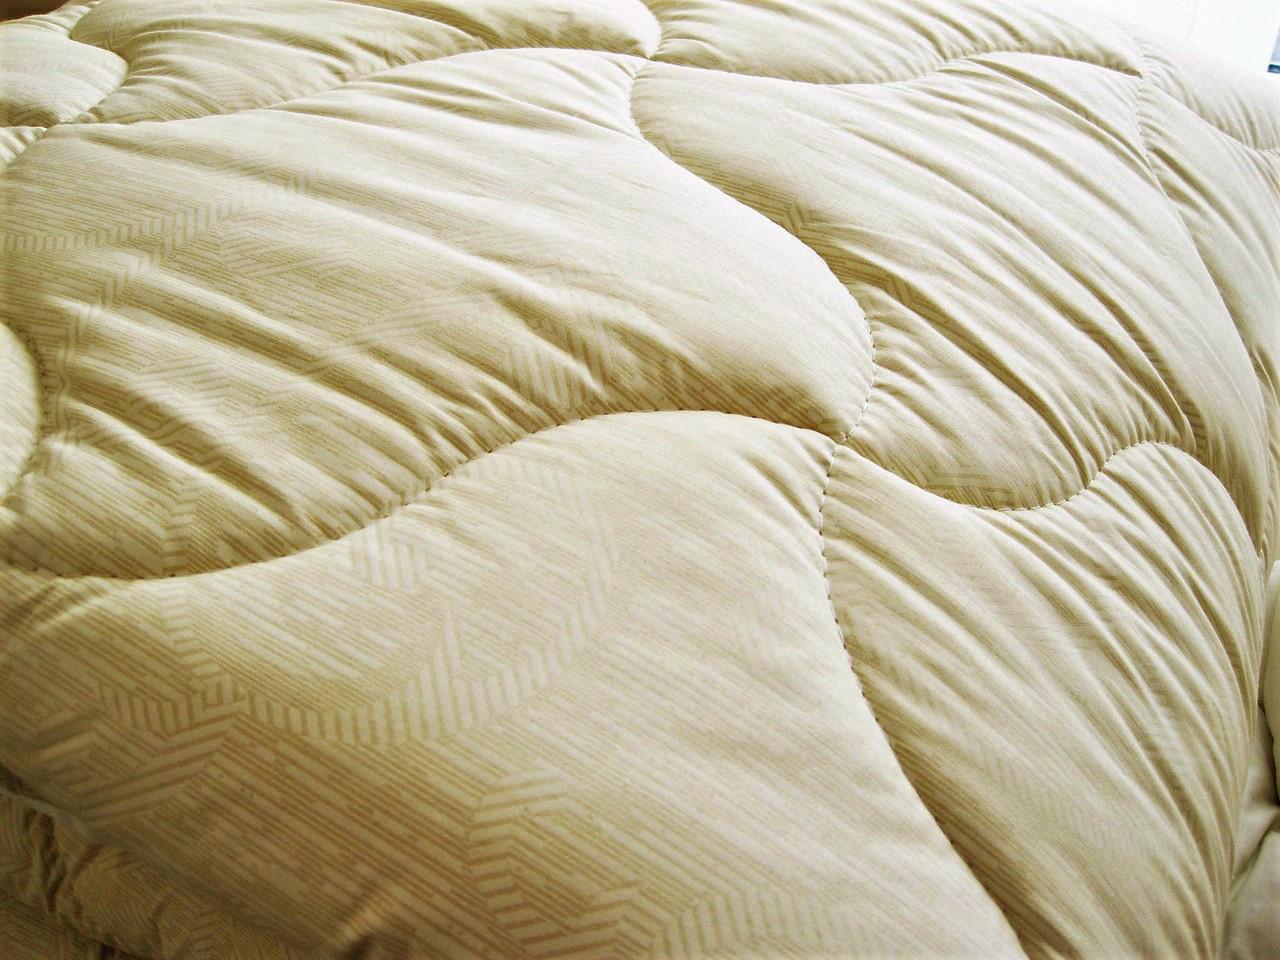 Теплое одеяло двуспальное Евро 200*210 (холофайбер, хлопок)